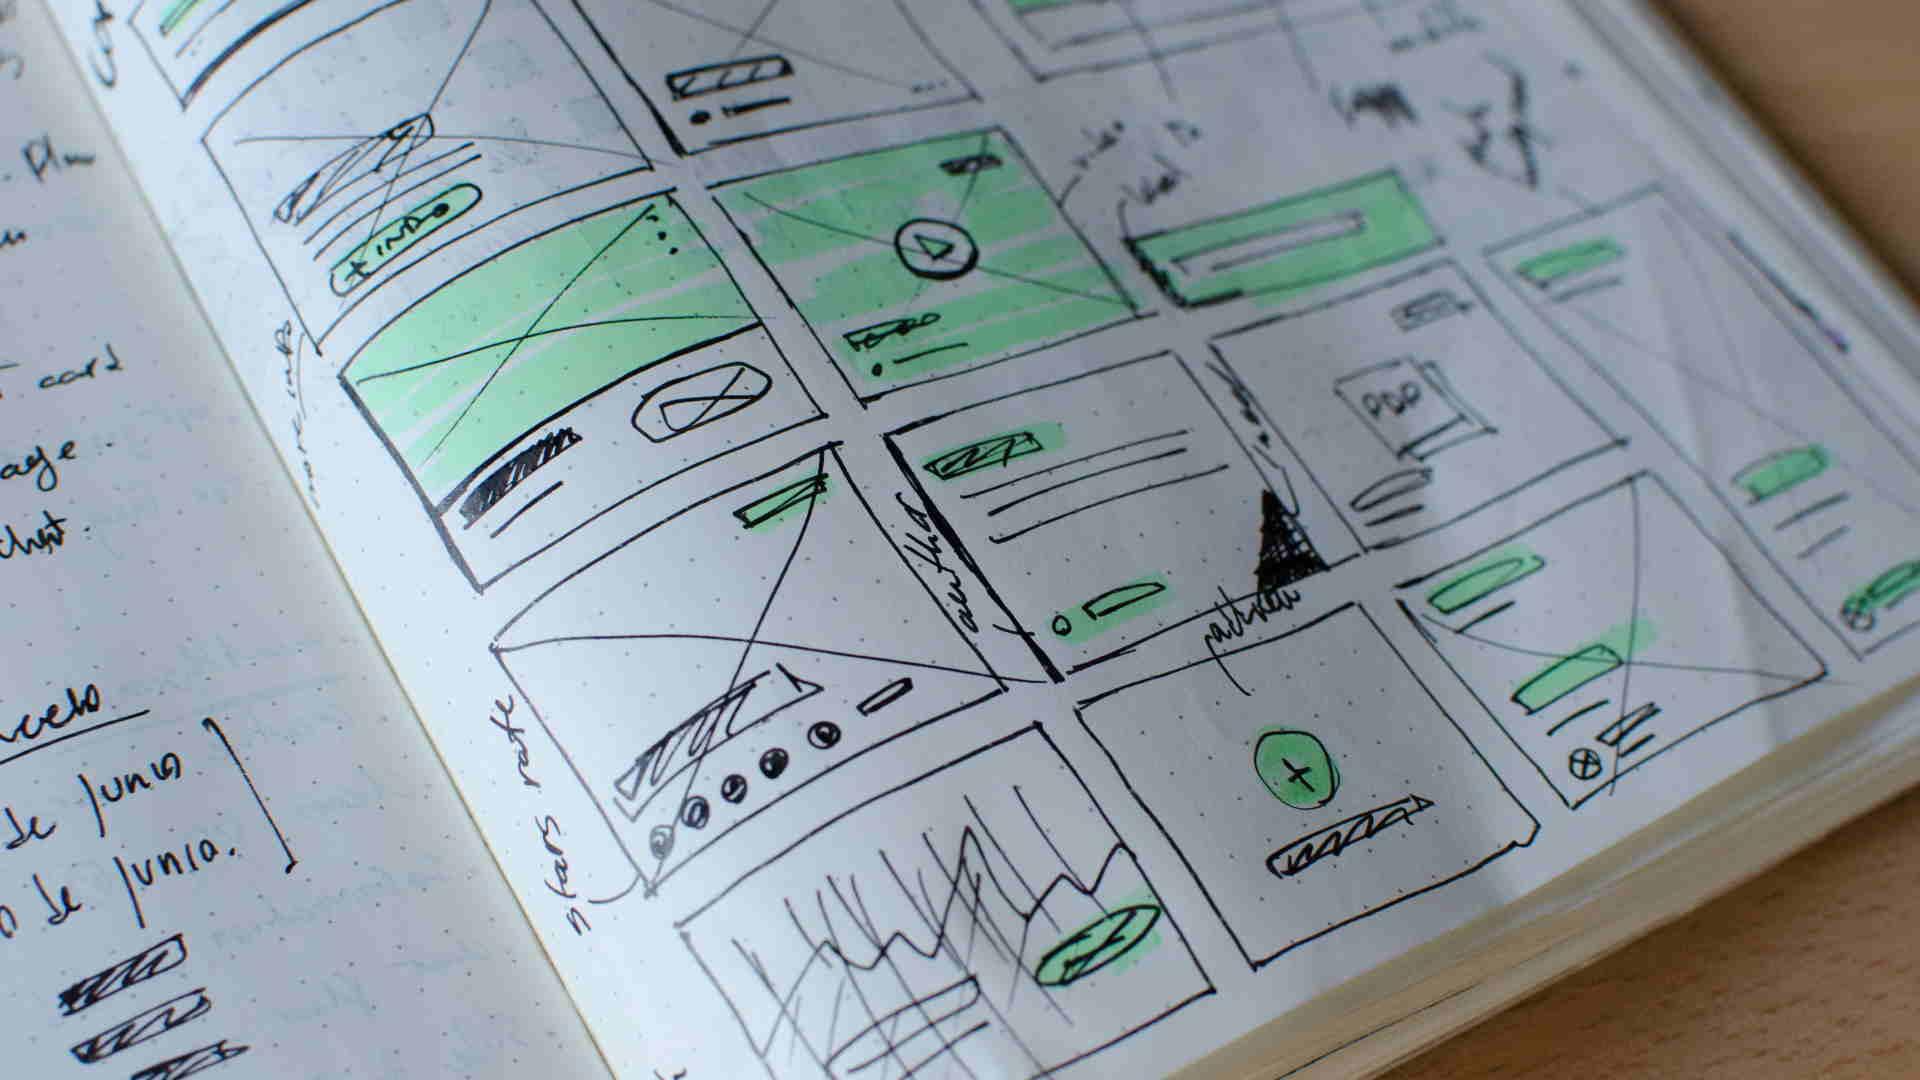 Research Visualisation Executive (Graphic Designer) - McCrindle Sydney